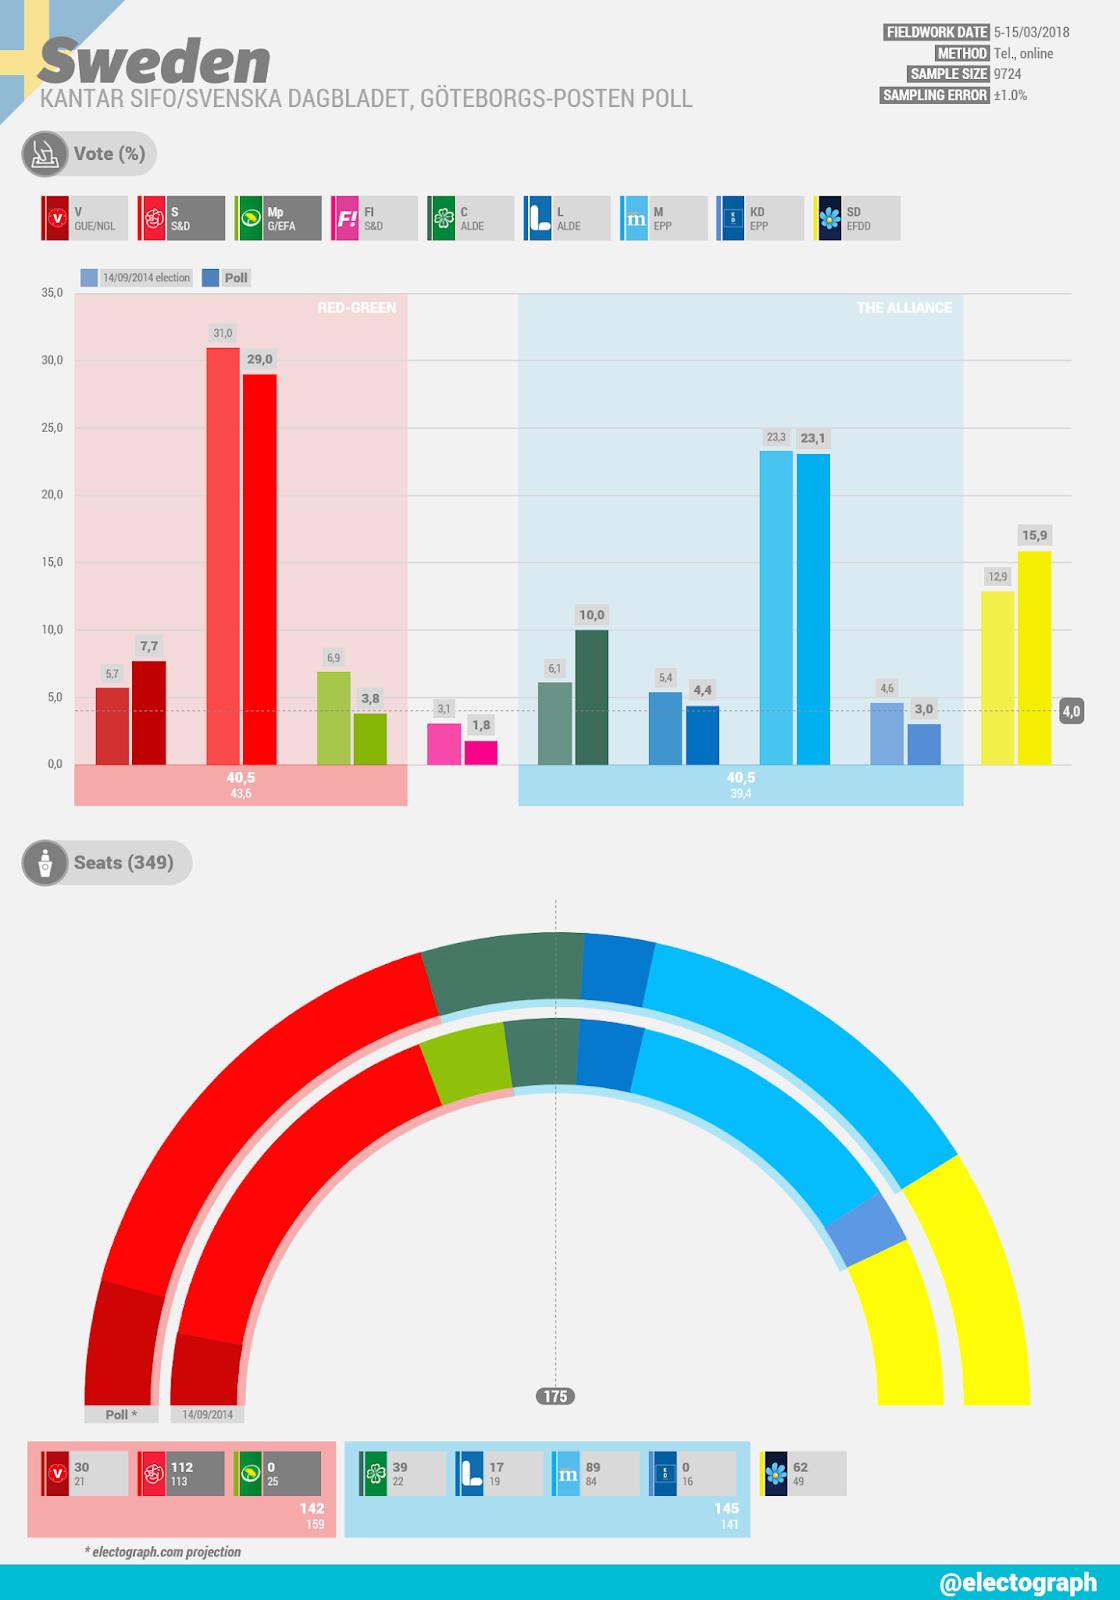 SWEDEN Kantar SIFO poll chart for Svenska Dagbladet and Göteborgs-Posten, March 2018